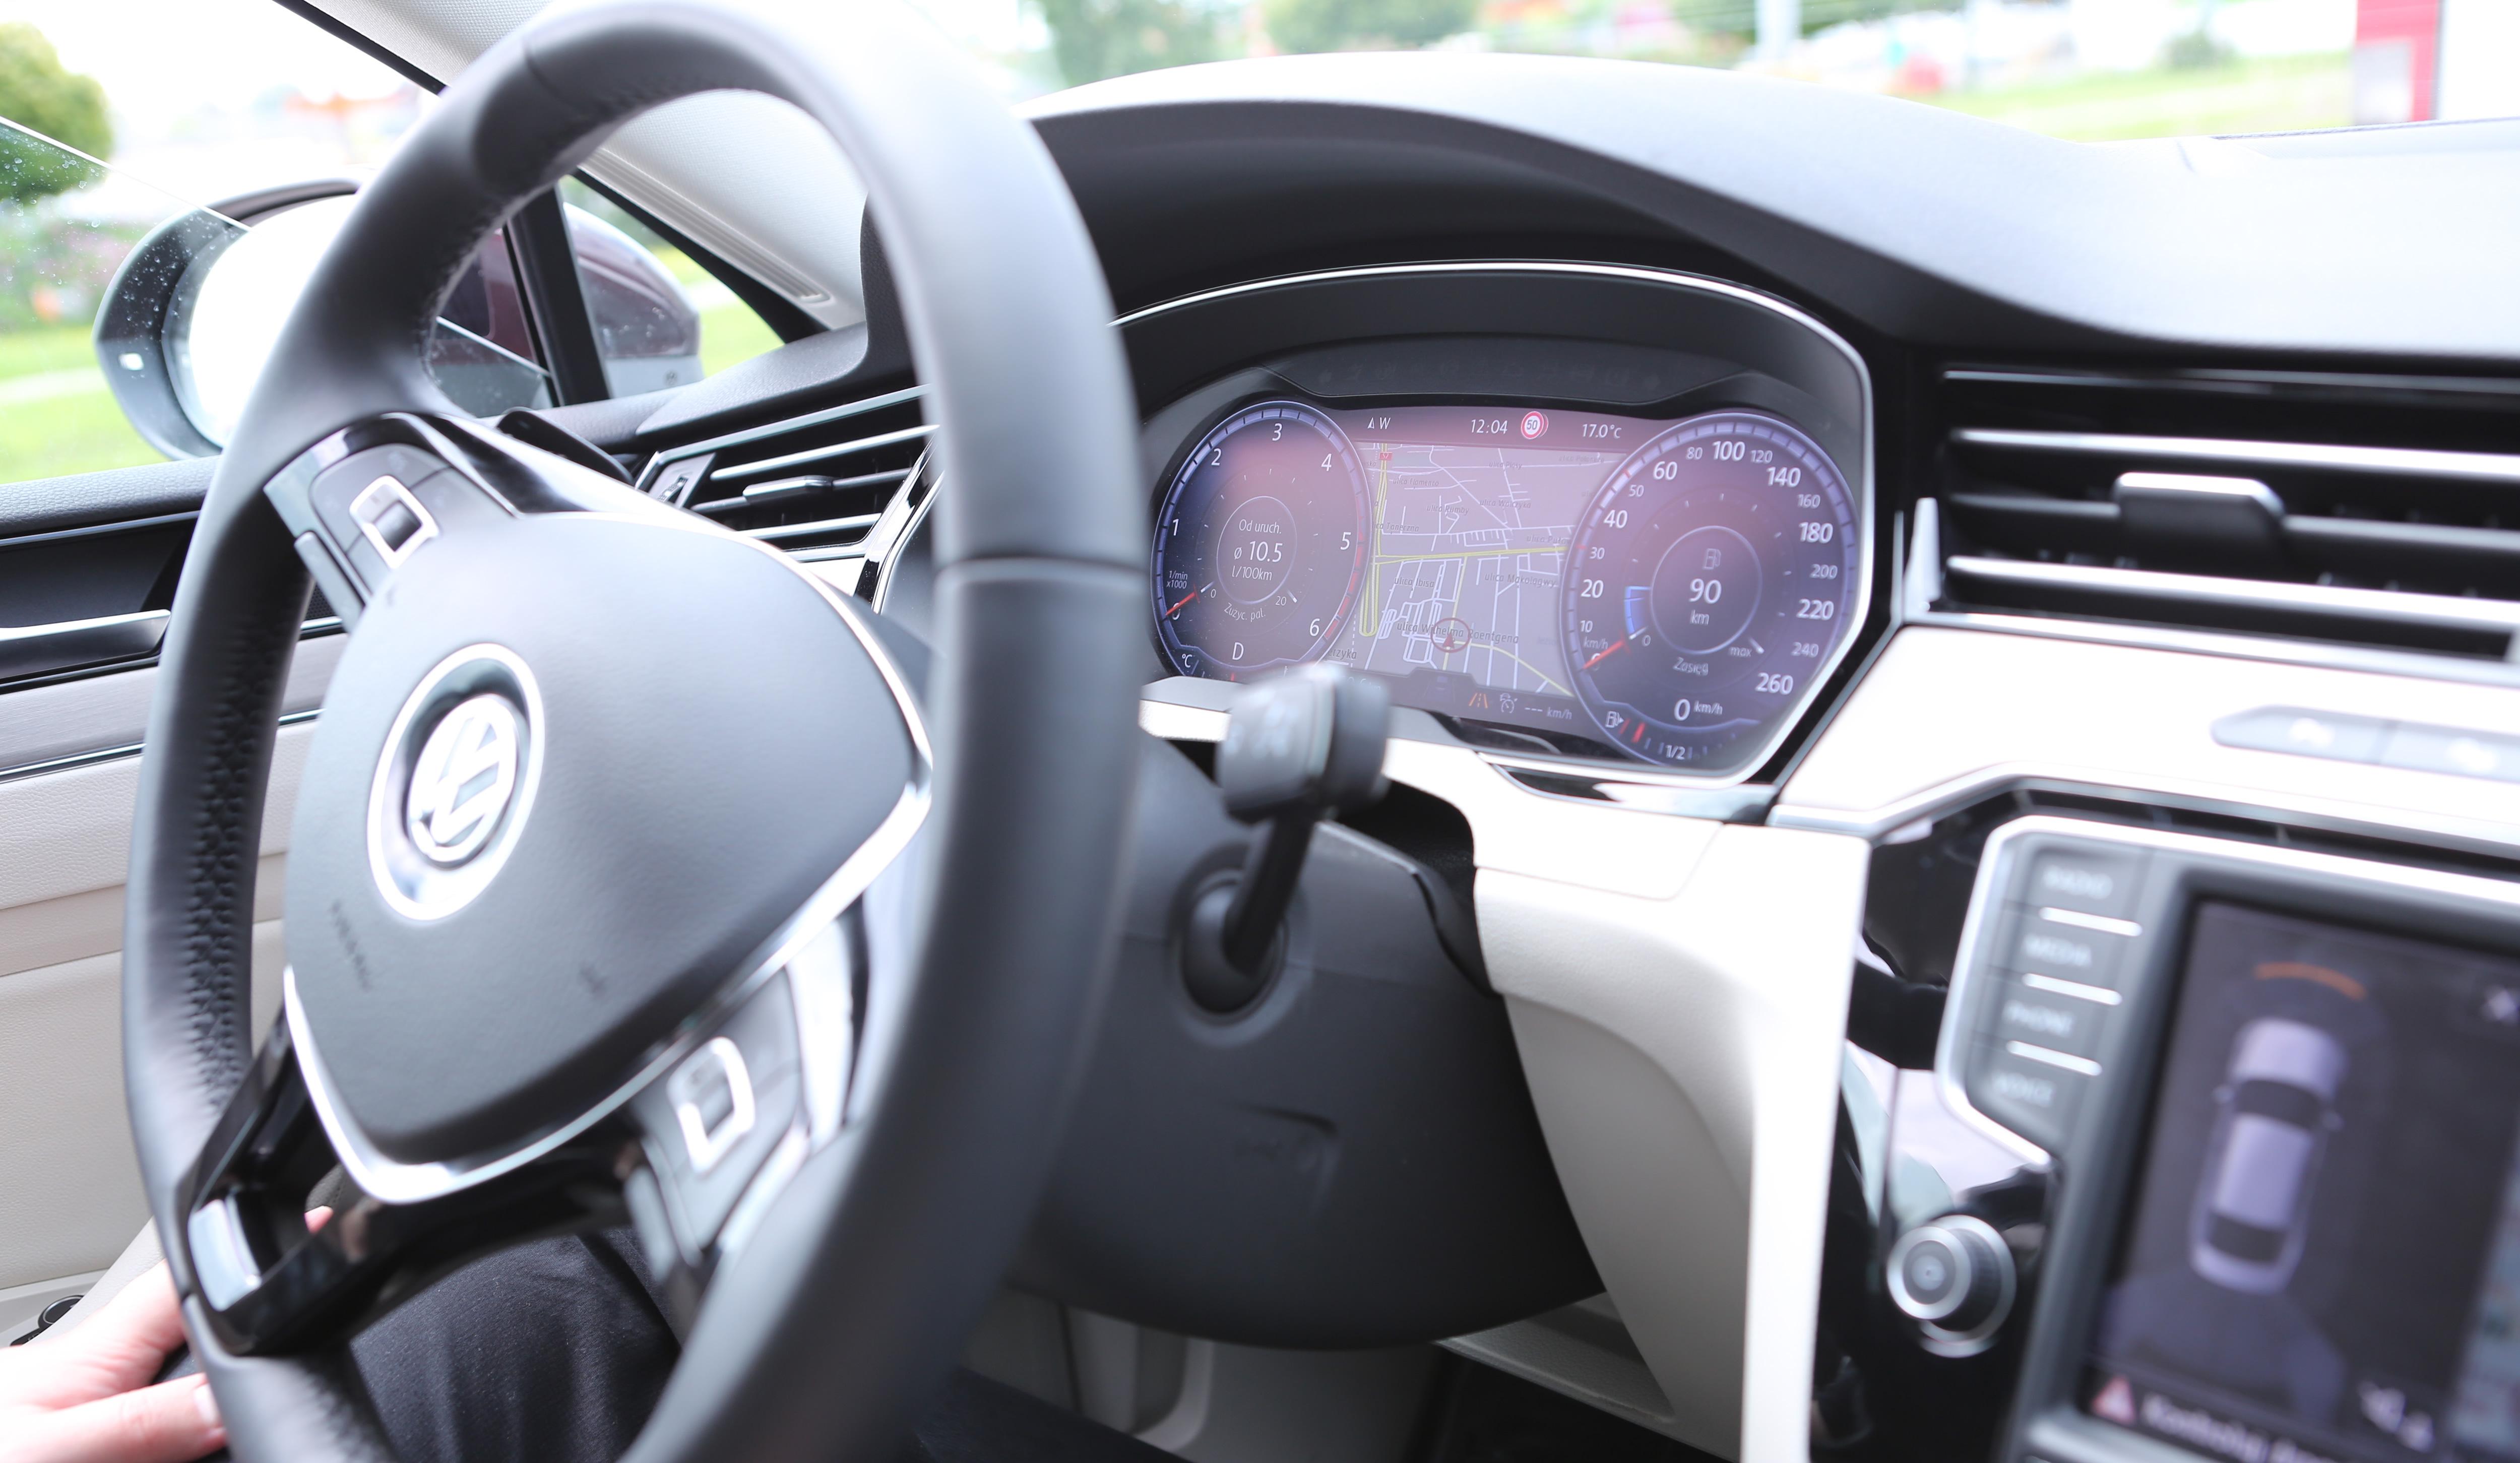 Audi Virtual Cockpit - ekrany w samochodach